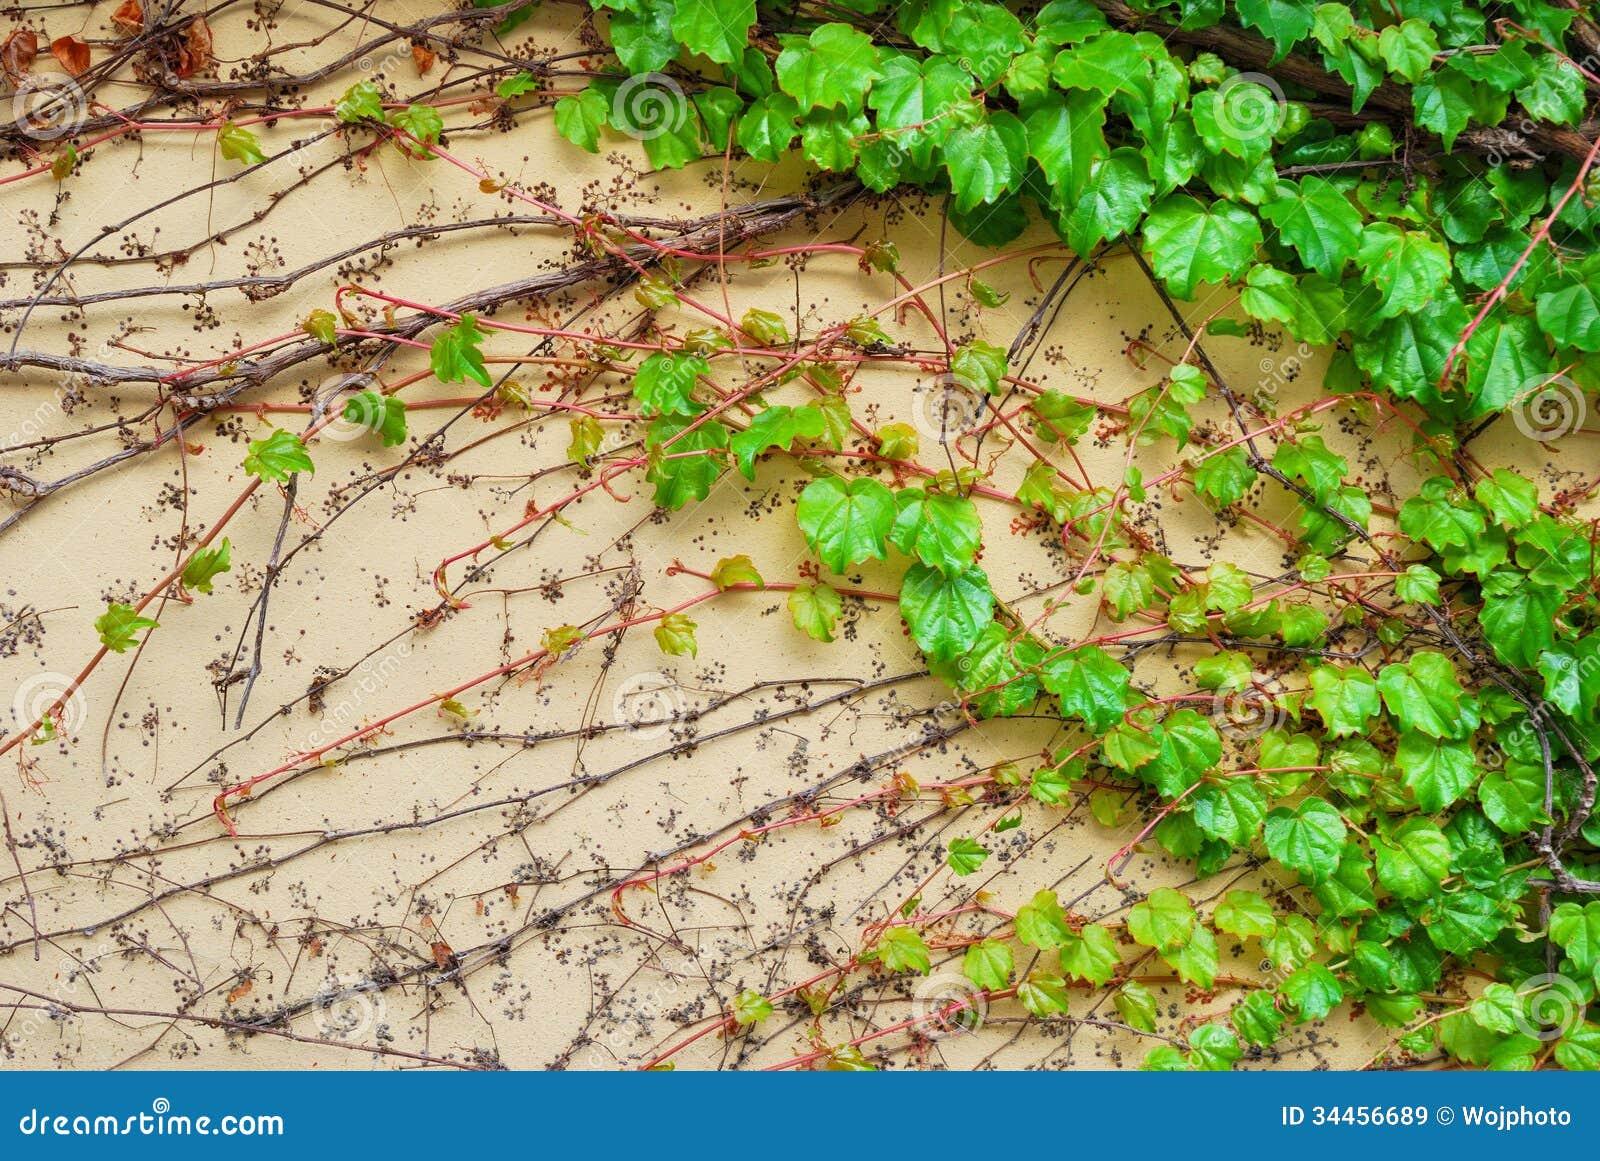 La plante grimpante verte de vigne part sur un mur de for La plante verte